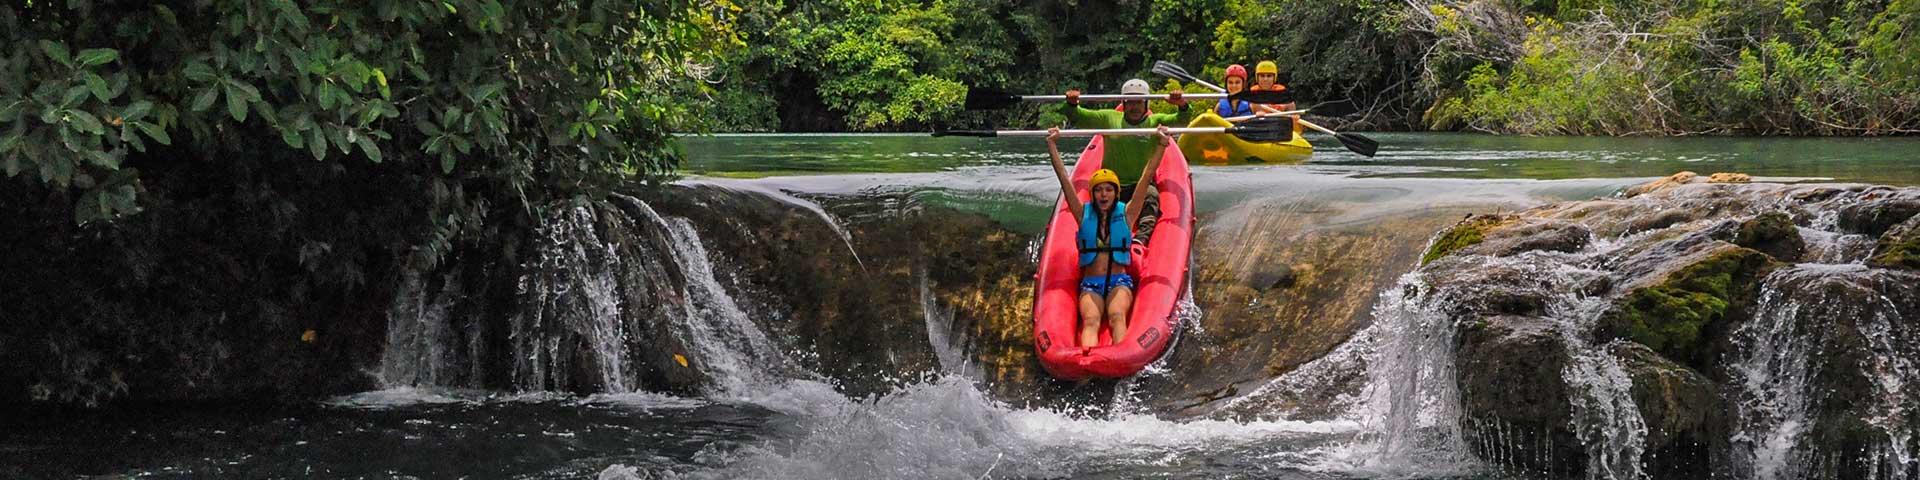 Duck-no-Rio-Formoso-aventura-Bonitour-Passeios-em-Bonito-MS-1117_1030.jpg